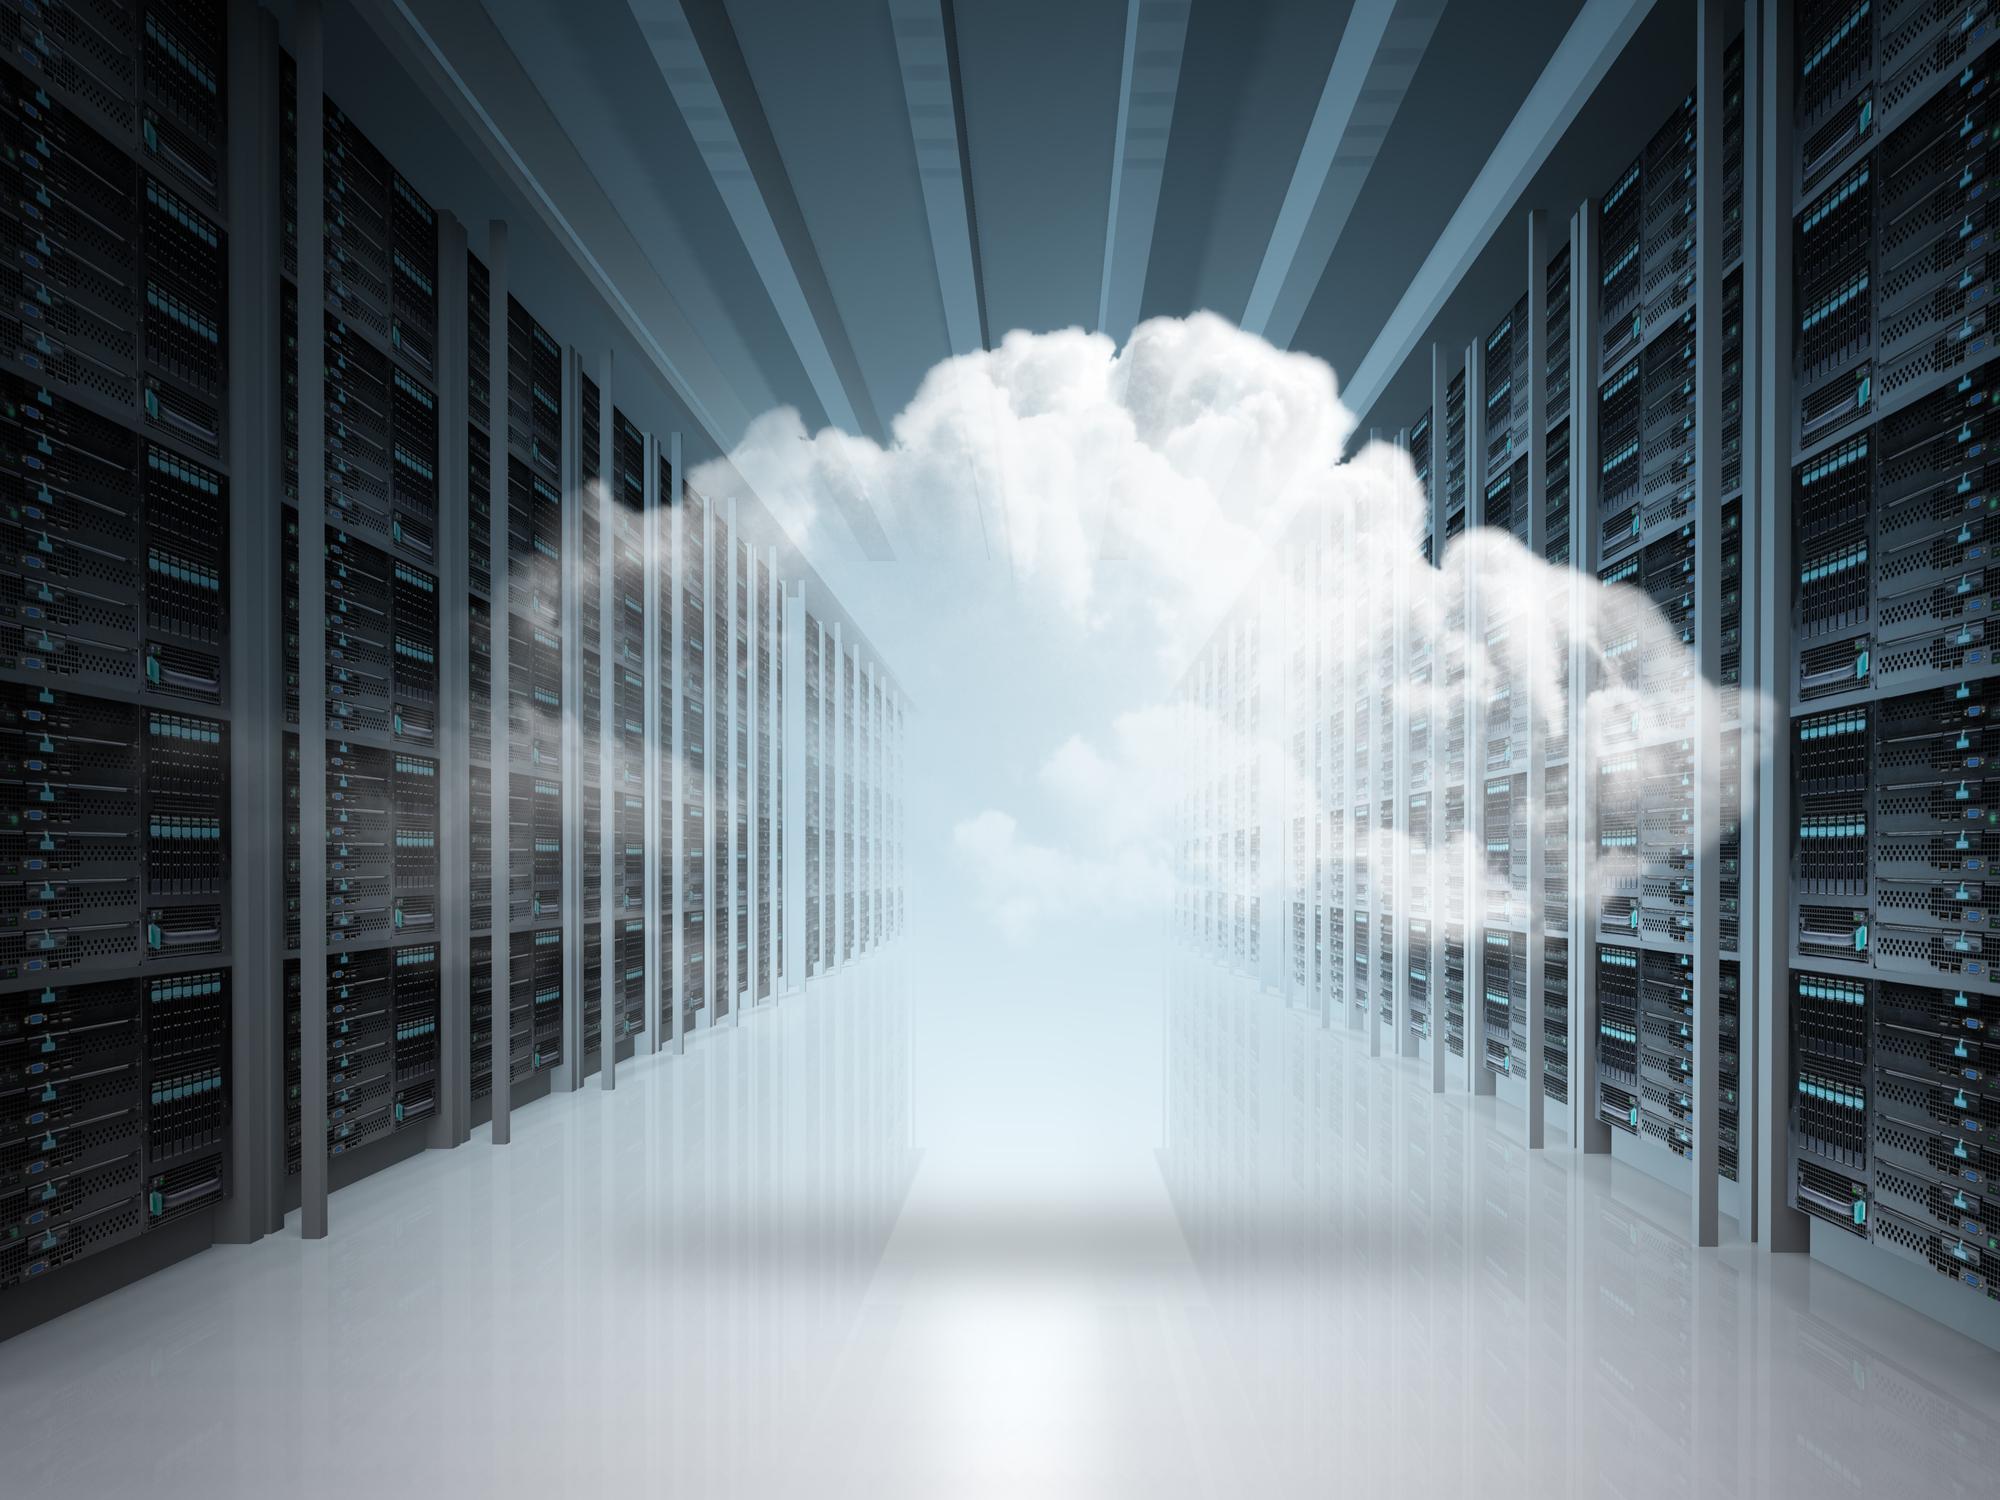 A cloud in a server room